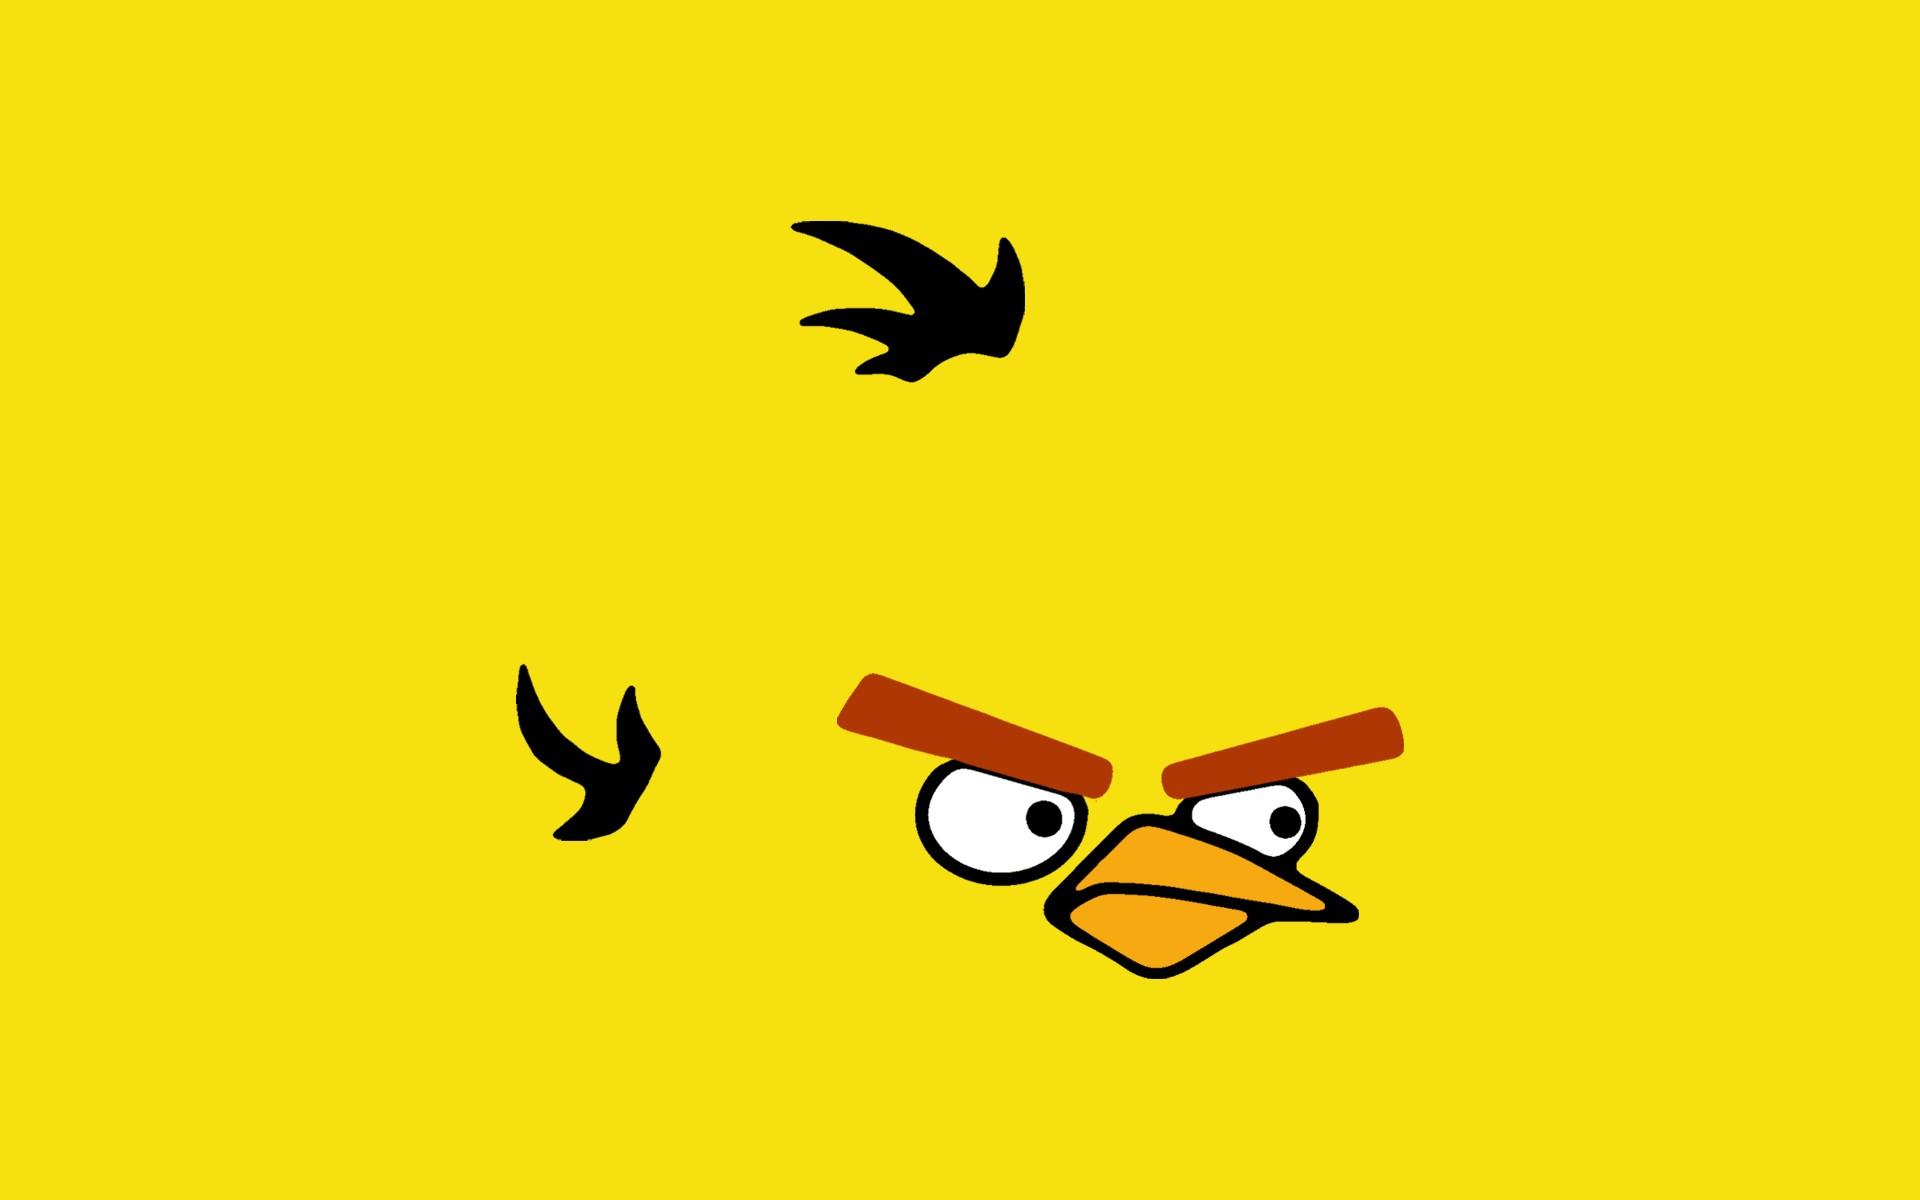 Free Yellow Bird Wallpaper 40087 1920x1200 px